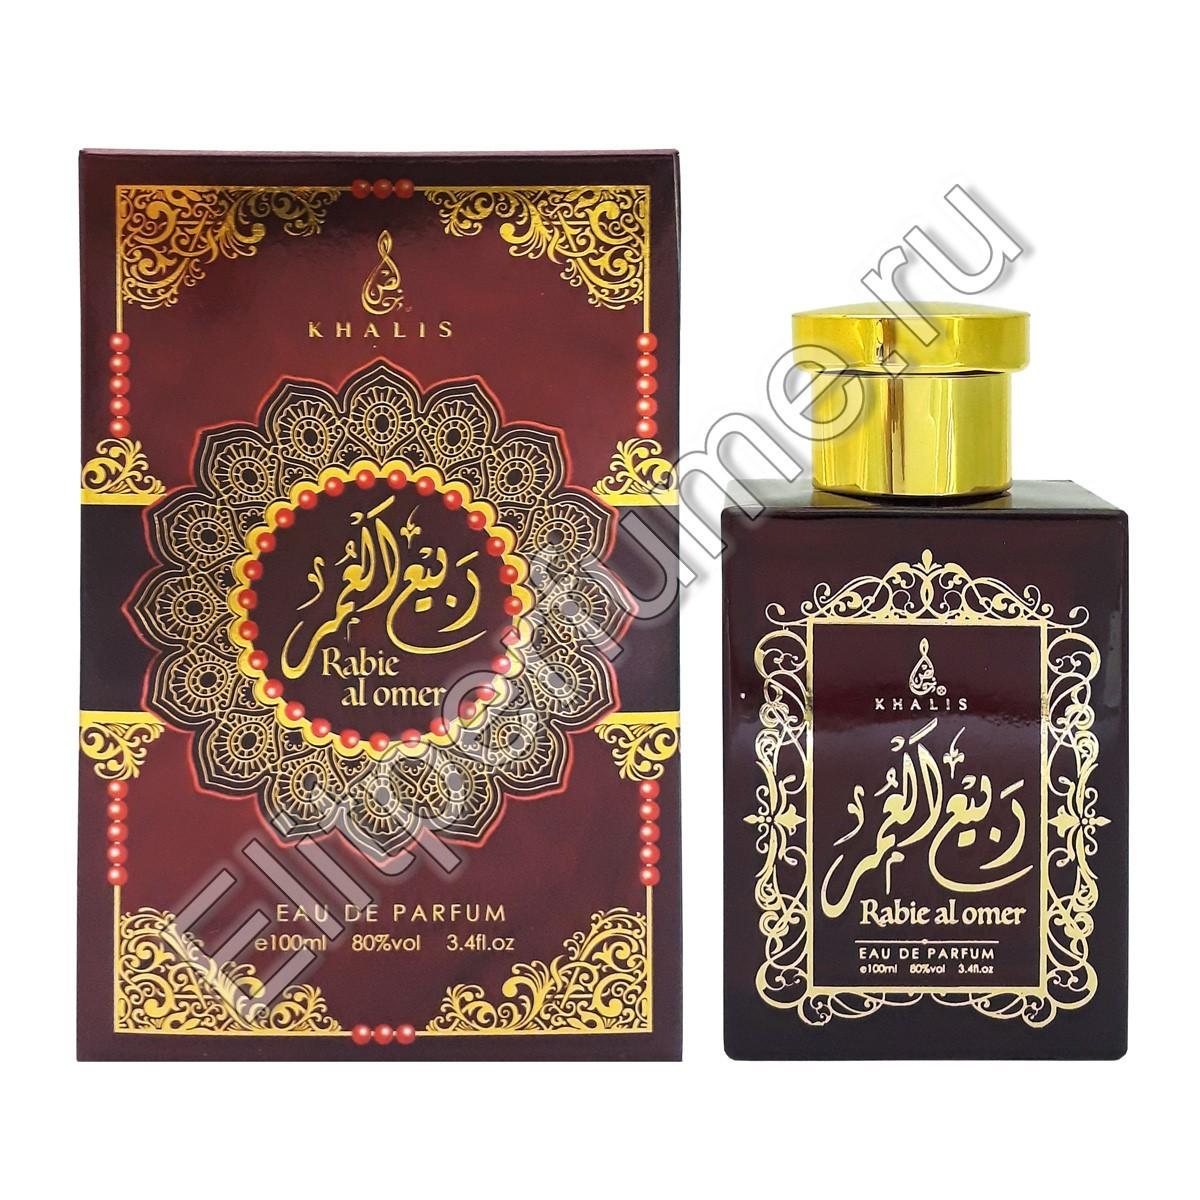 Rabie Al Omer u EDP 100 ML SPR спрей от Reev Khalis Perfumes Халис